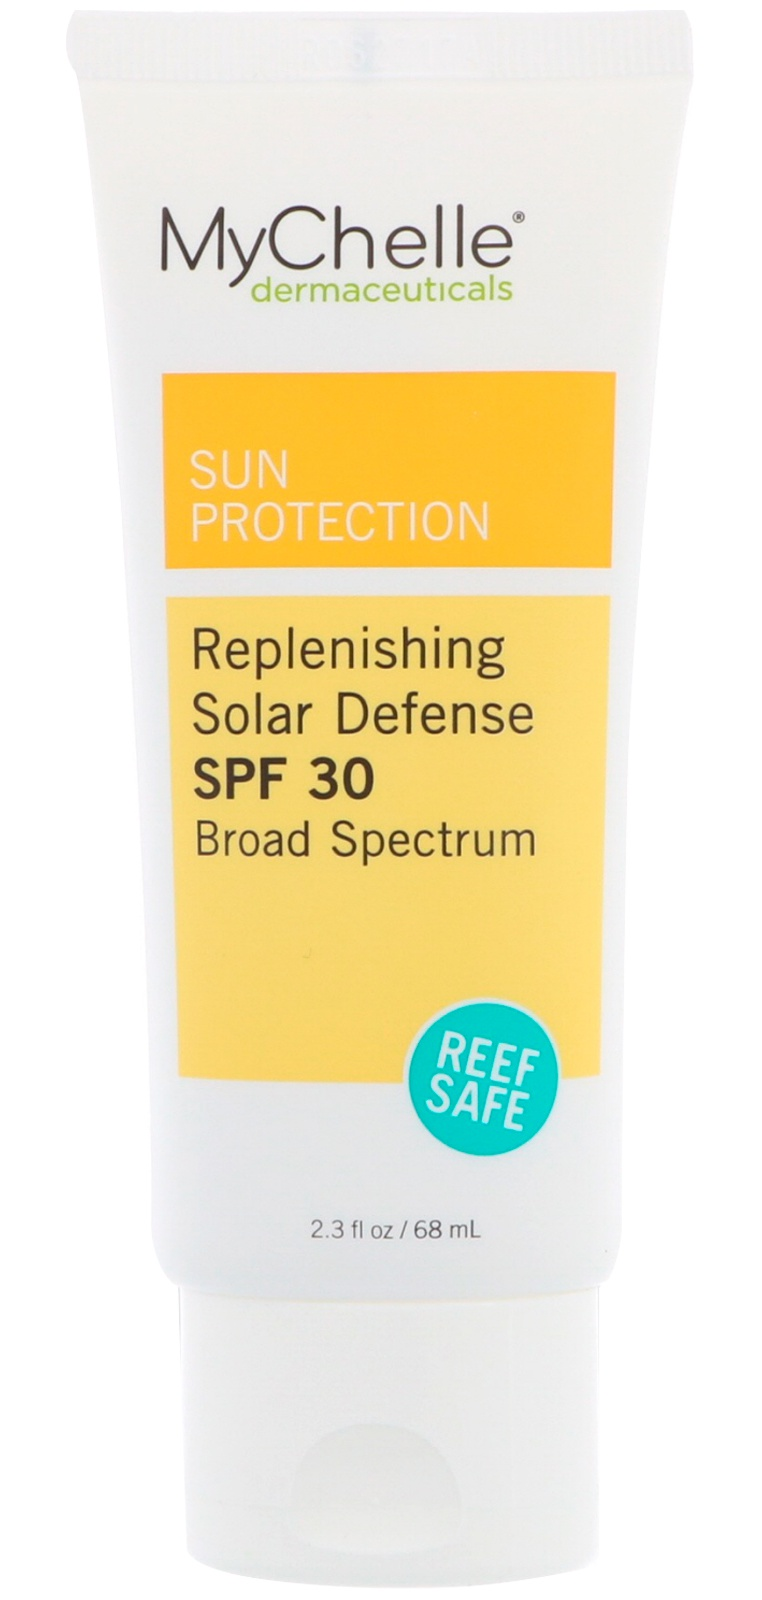 MyChelle Dermaceuticals Replenishing Solar Defense Spf 30